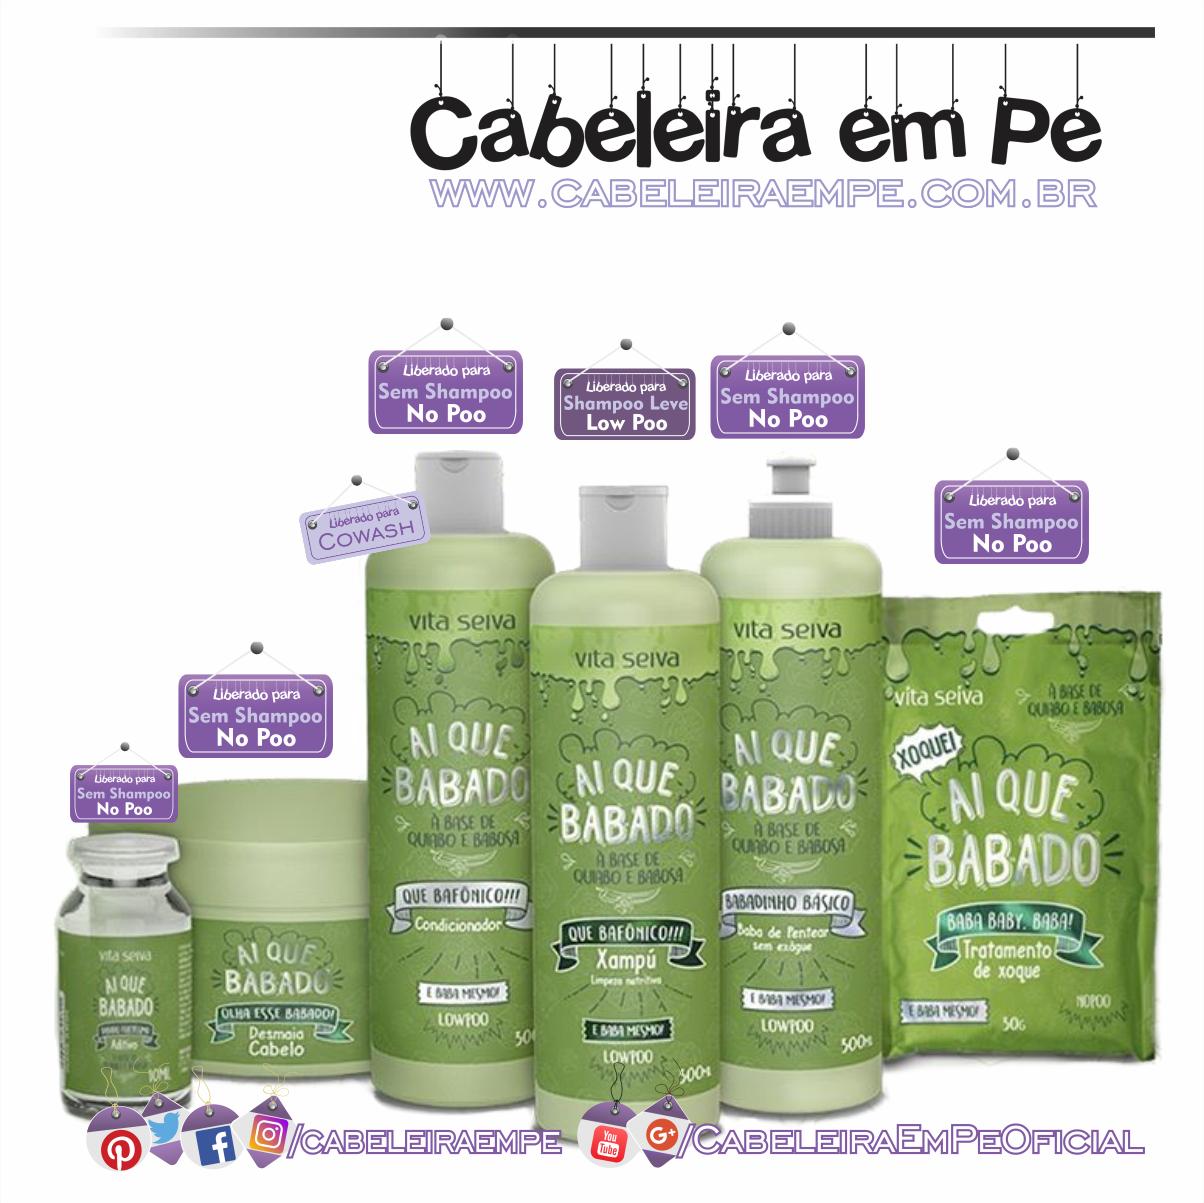 912eee79a Linha Ai que Babado Vita Seiva (Shampoo liberad para Low Poo - Máscara,  Aditivo